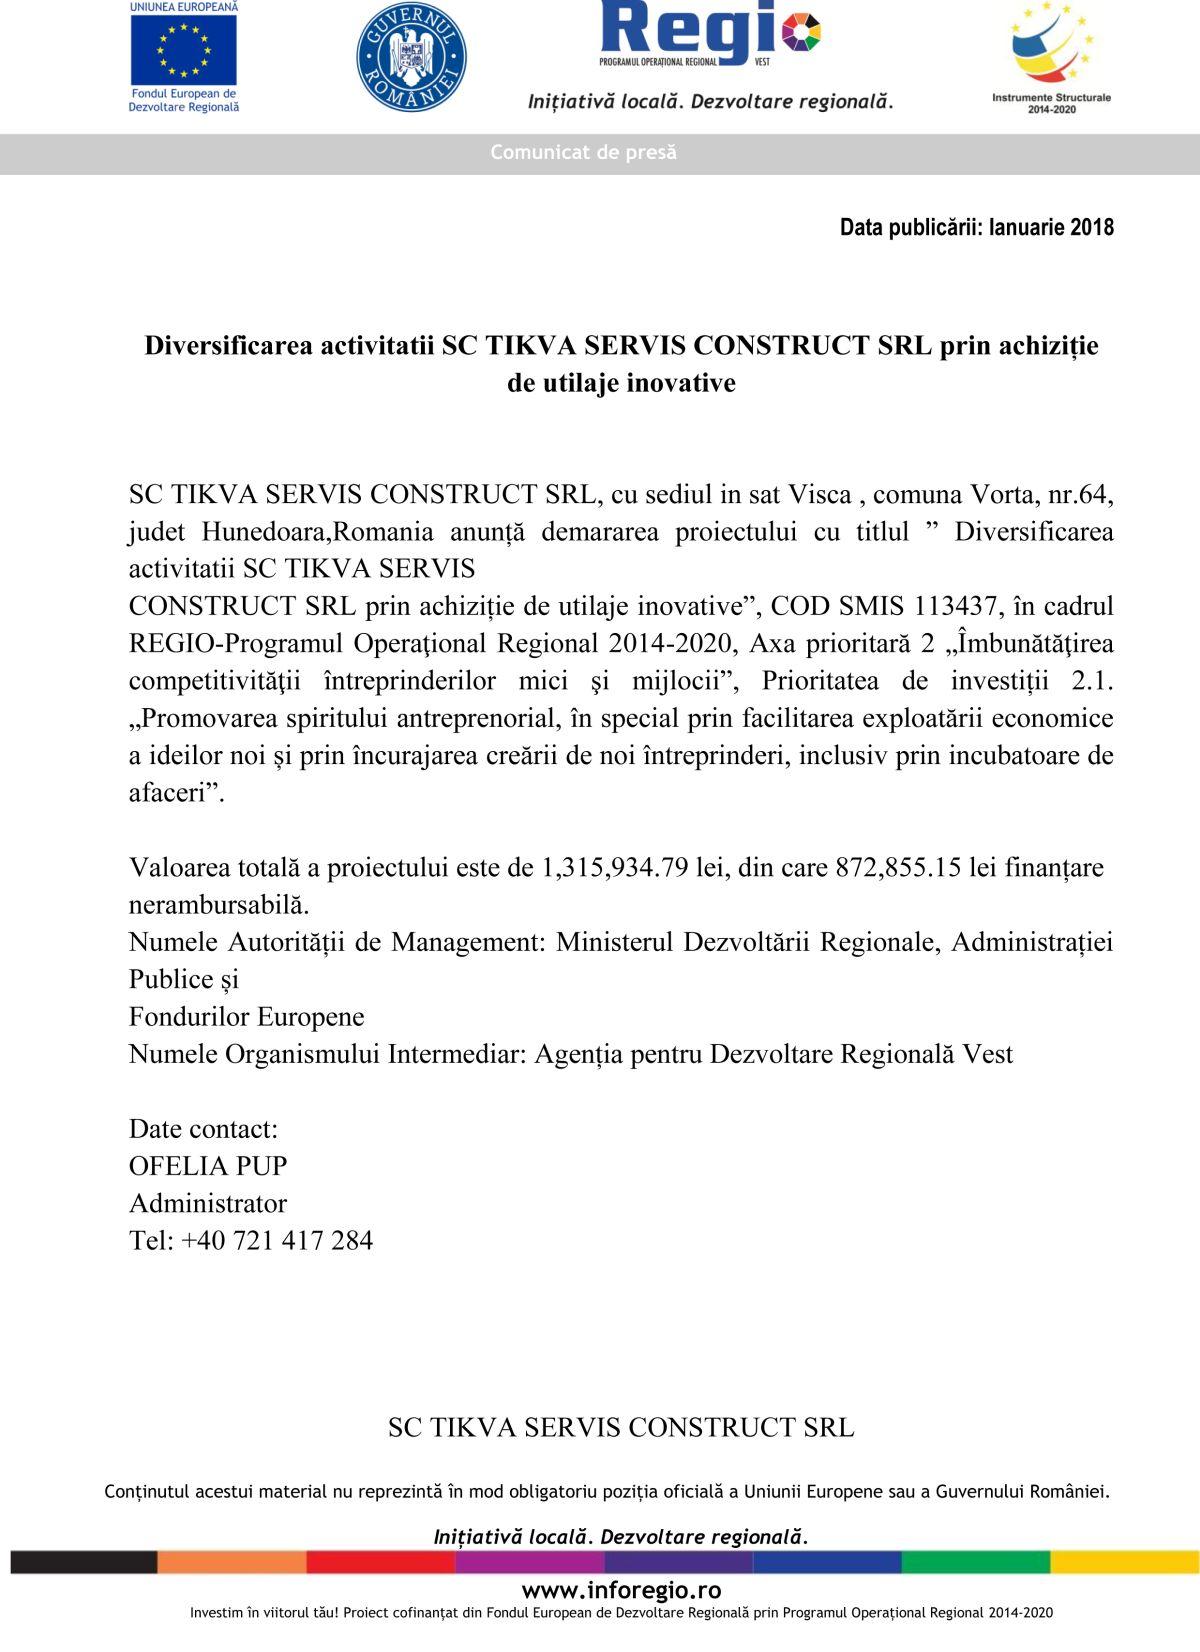 Photo of Diversificarea activitatii SC TIKVA SERVIS CONSTRUCT SRL prin achiziție de utilaje inovative